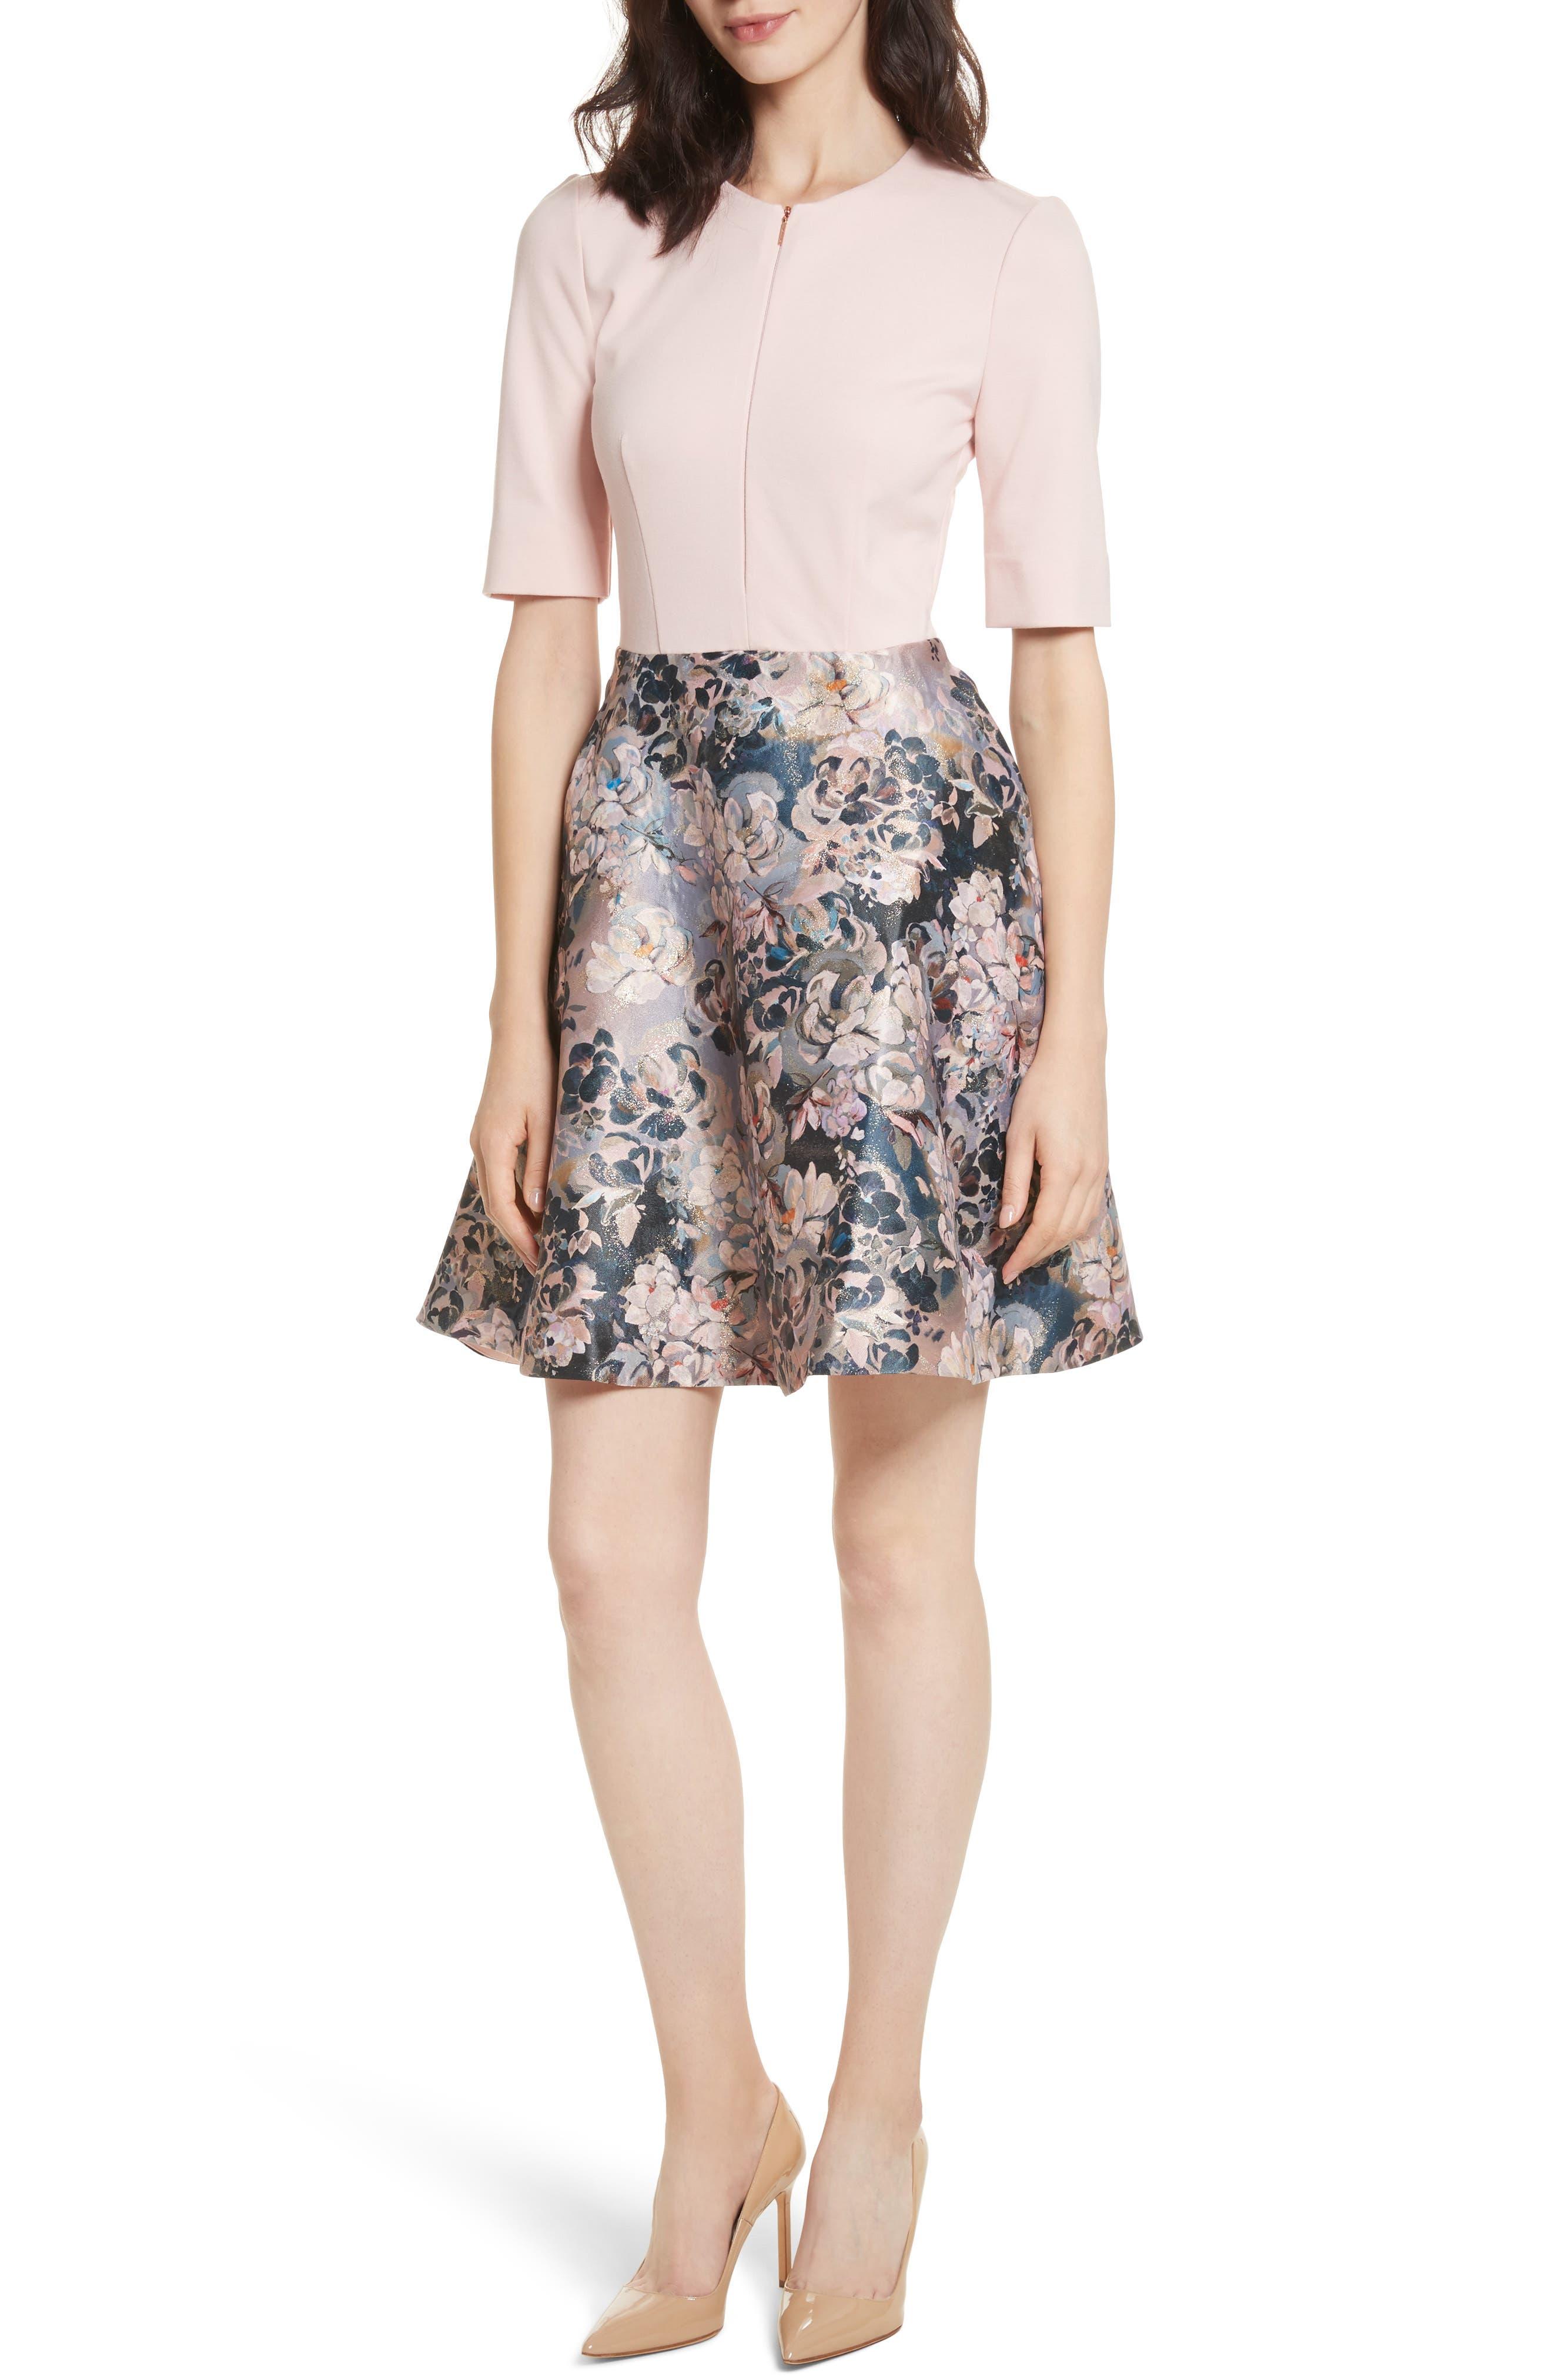 Eloquent Jacquard Skater Dress,                             Main thumbnail 1, color,                             Pale Pink